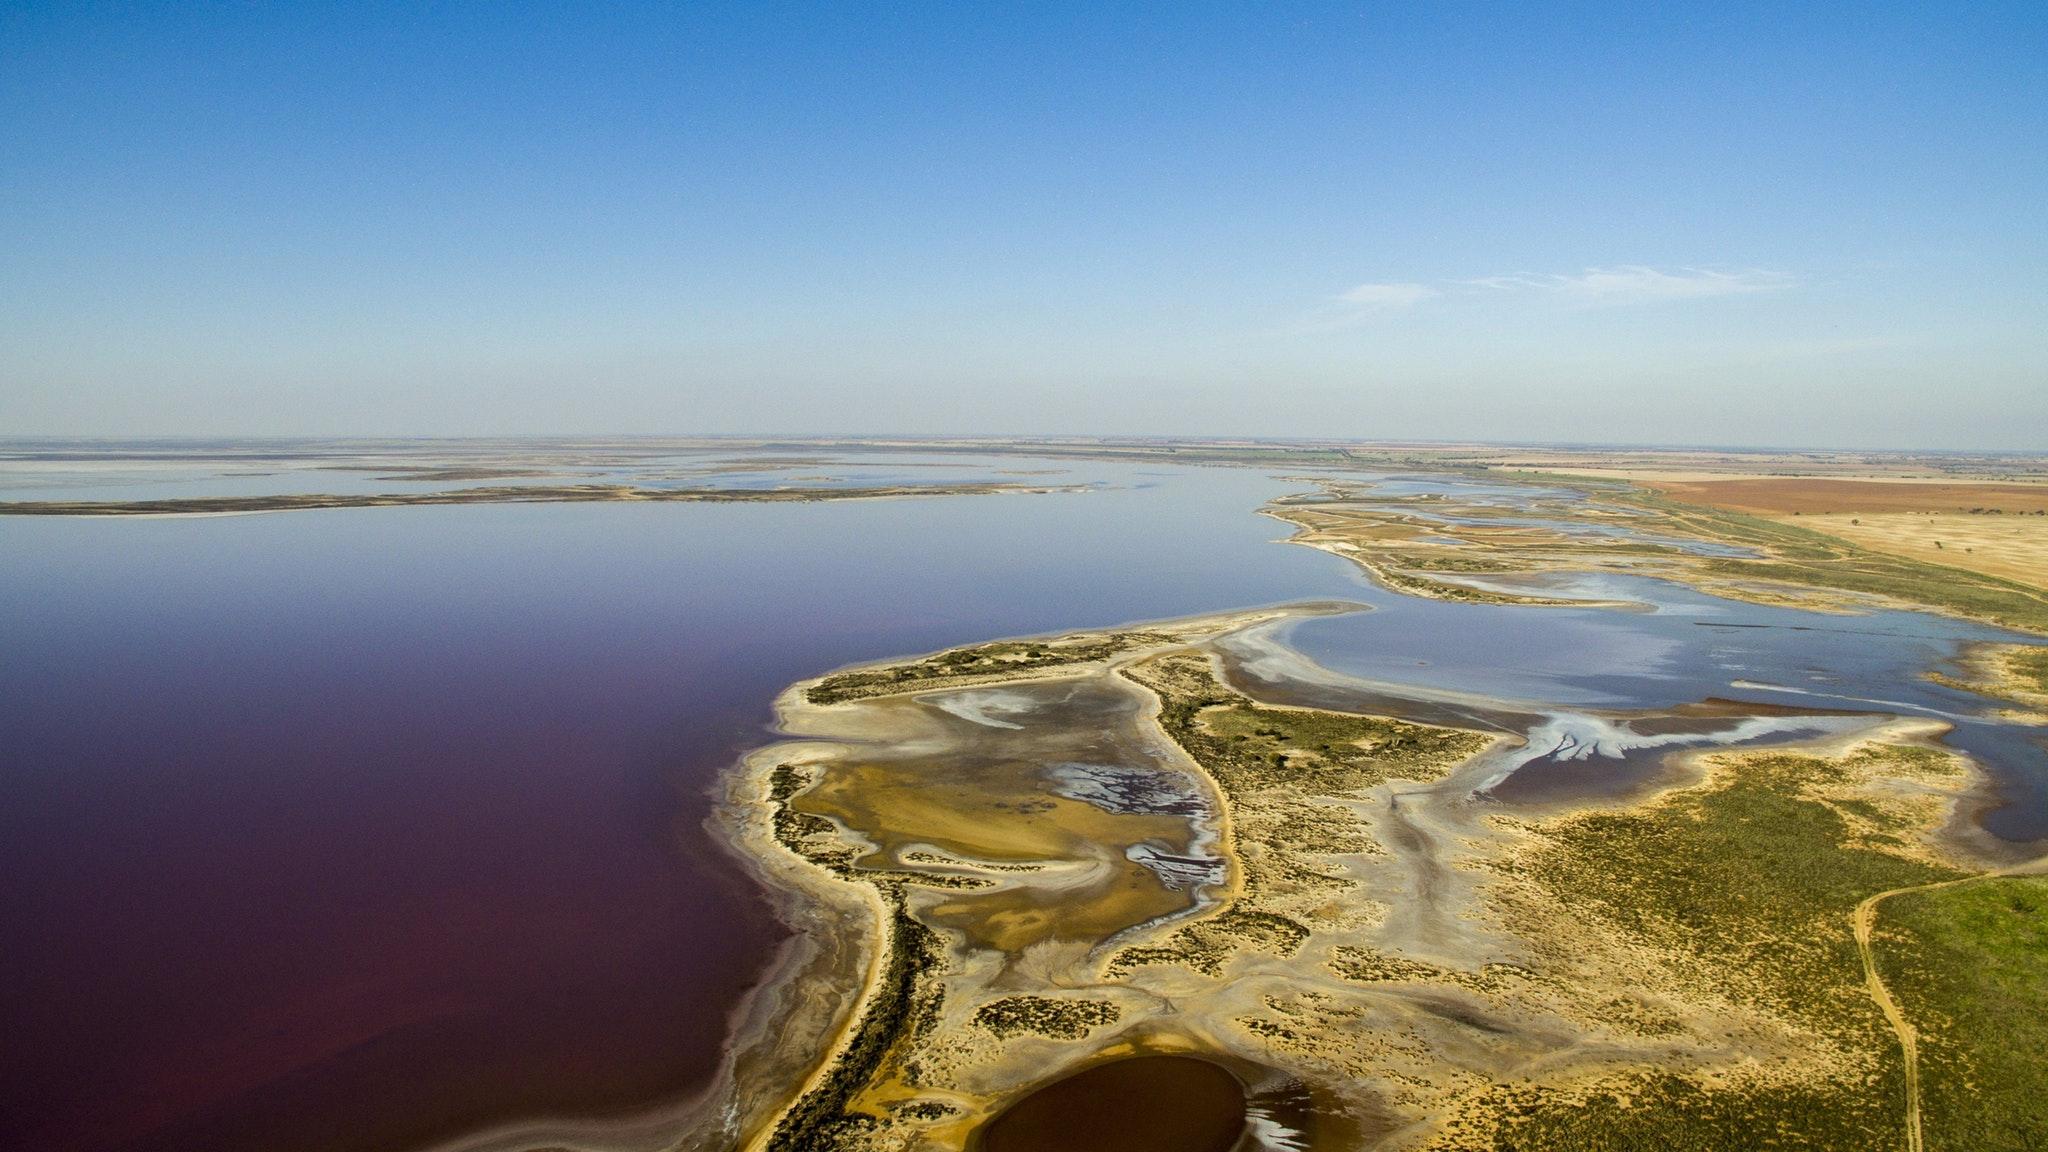 Promhelis Flight - Lake Tyrell, The Pink Lake